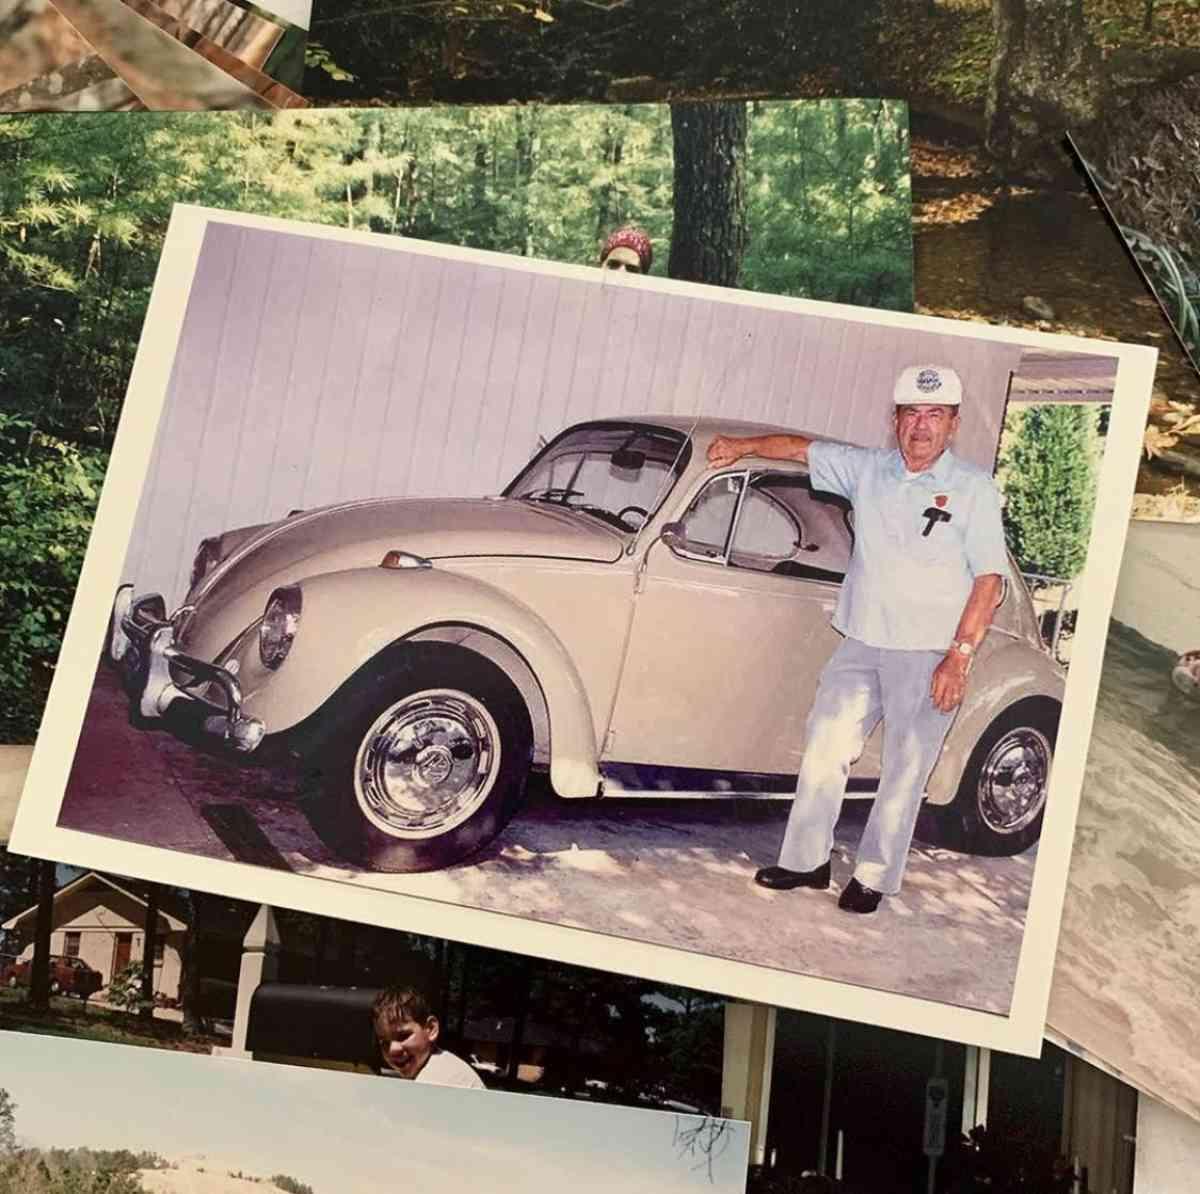 VW grandpa